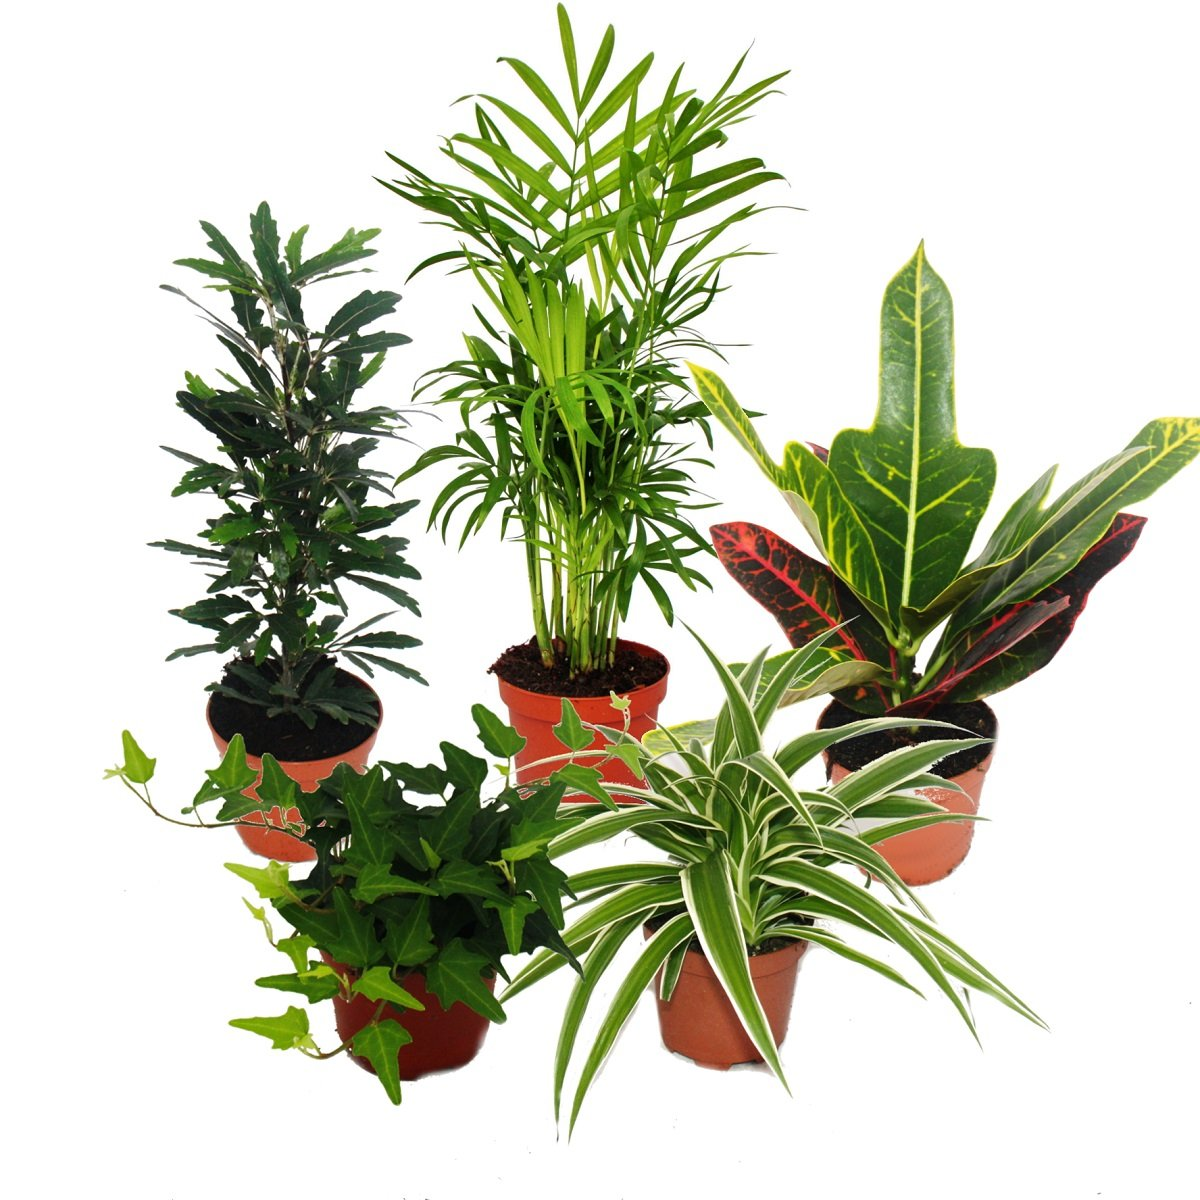 Mini Indoor Plant Mix - Set of 5 plants - 9cm pot Exotenherz